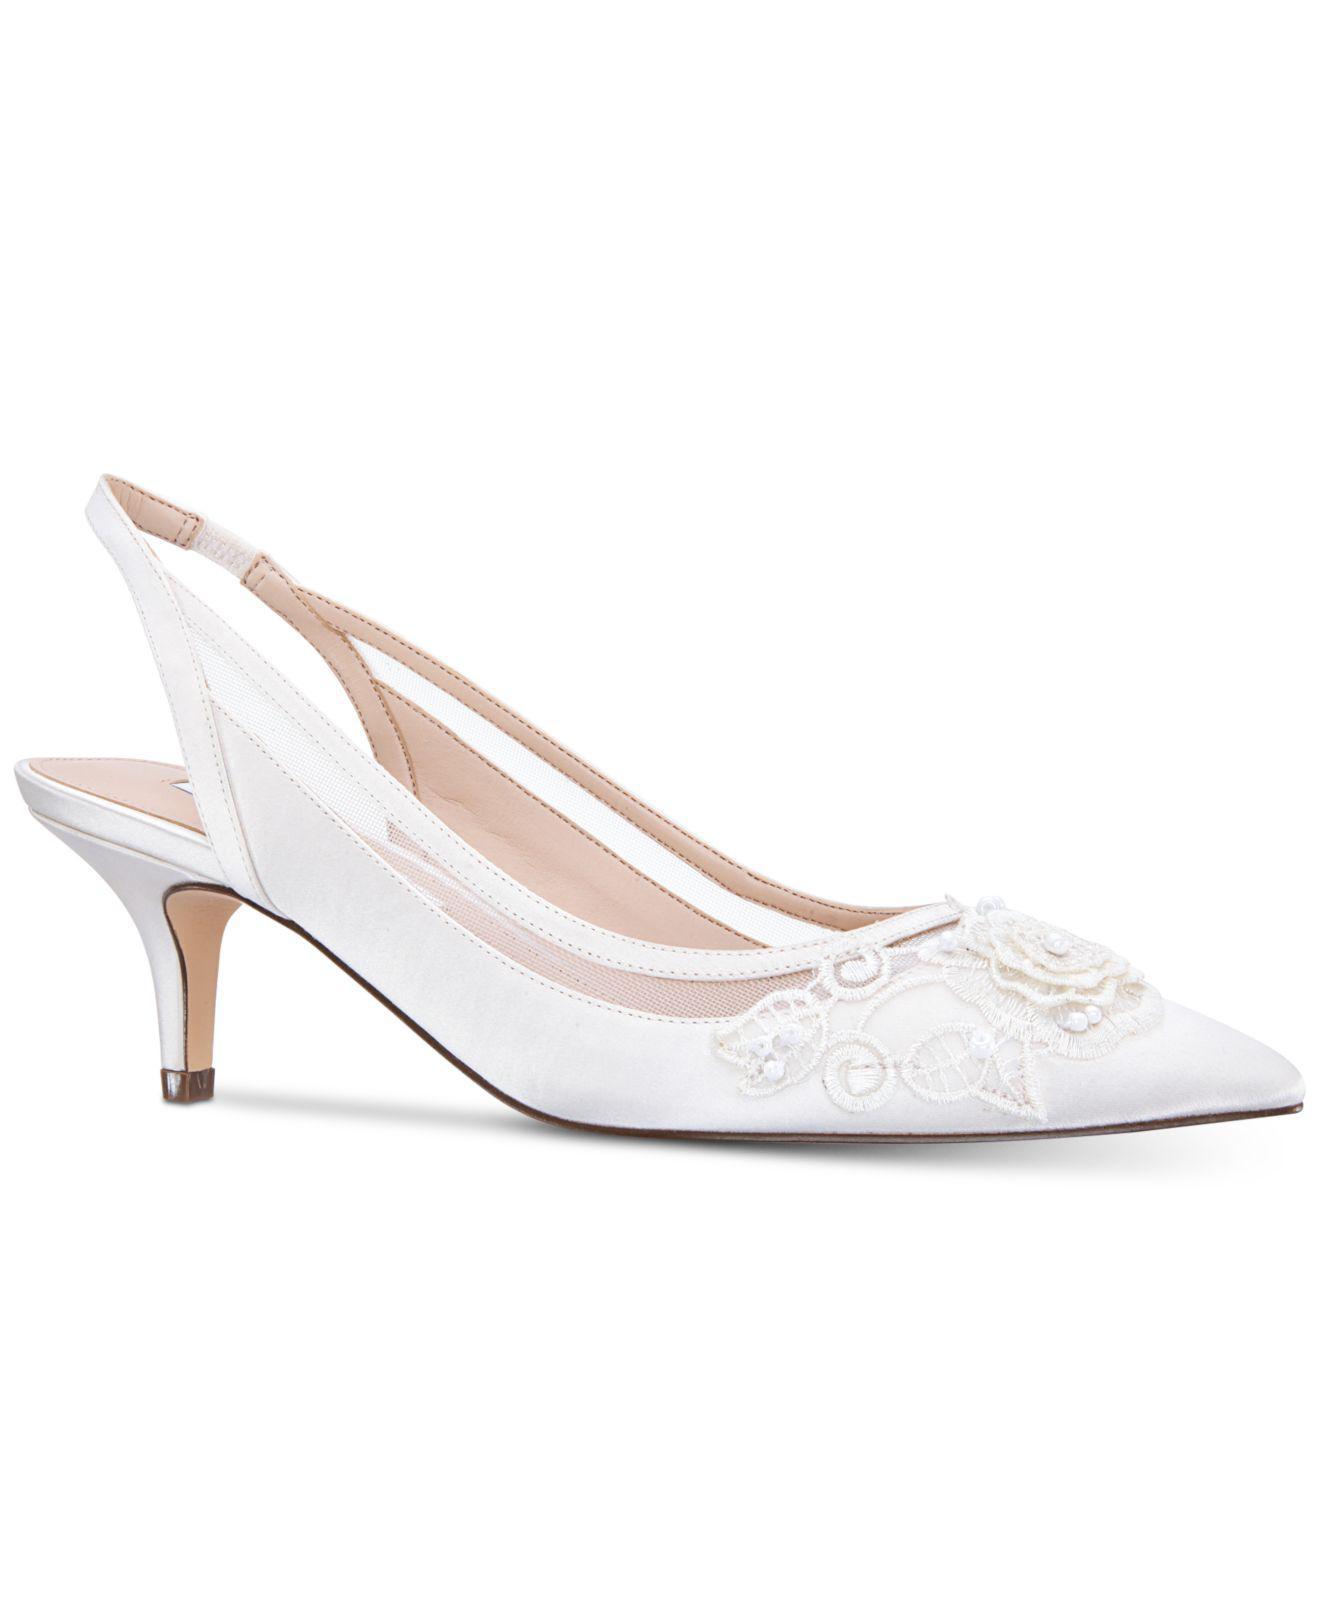 2f0c0bf0e310 Lyst - Nina Taela Evening Sandals in White